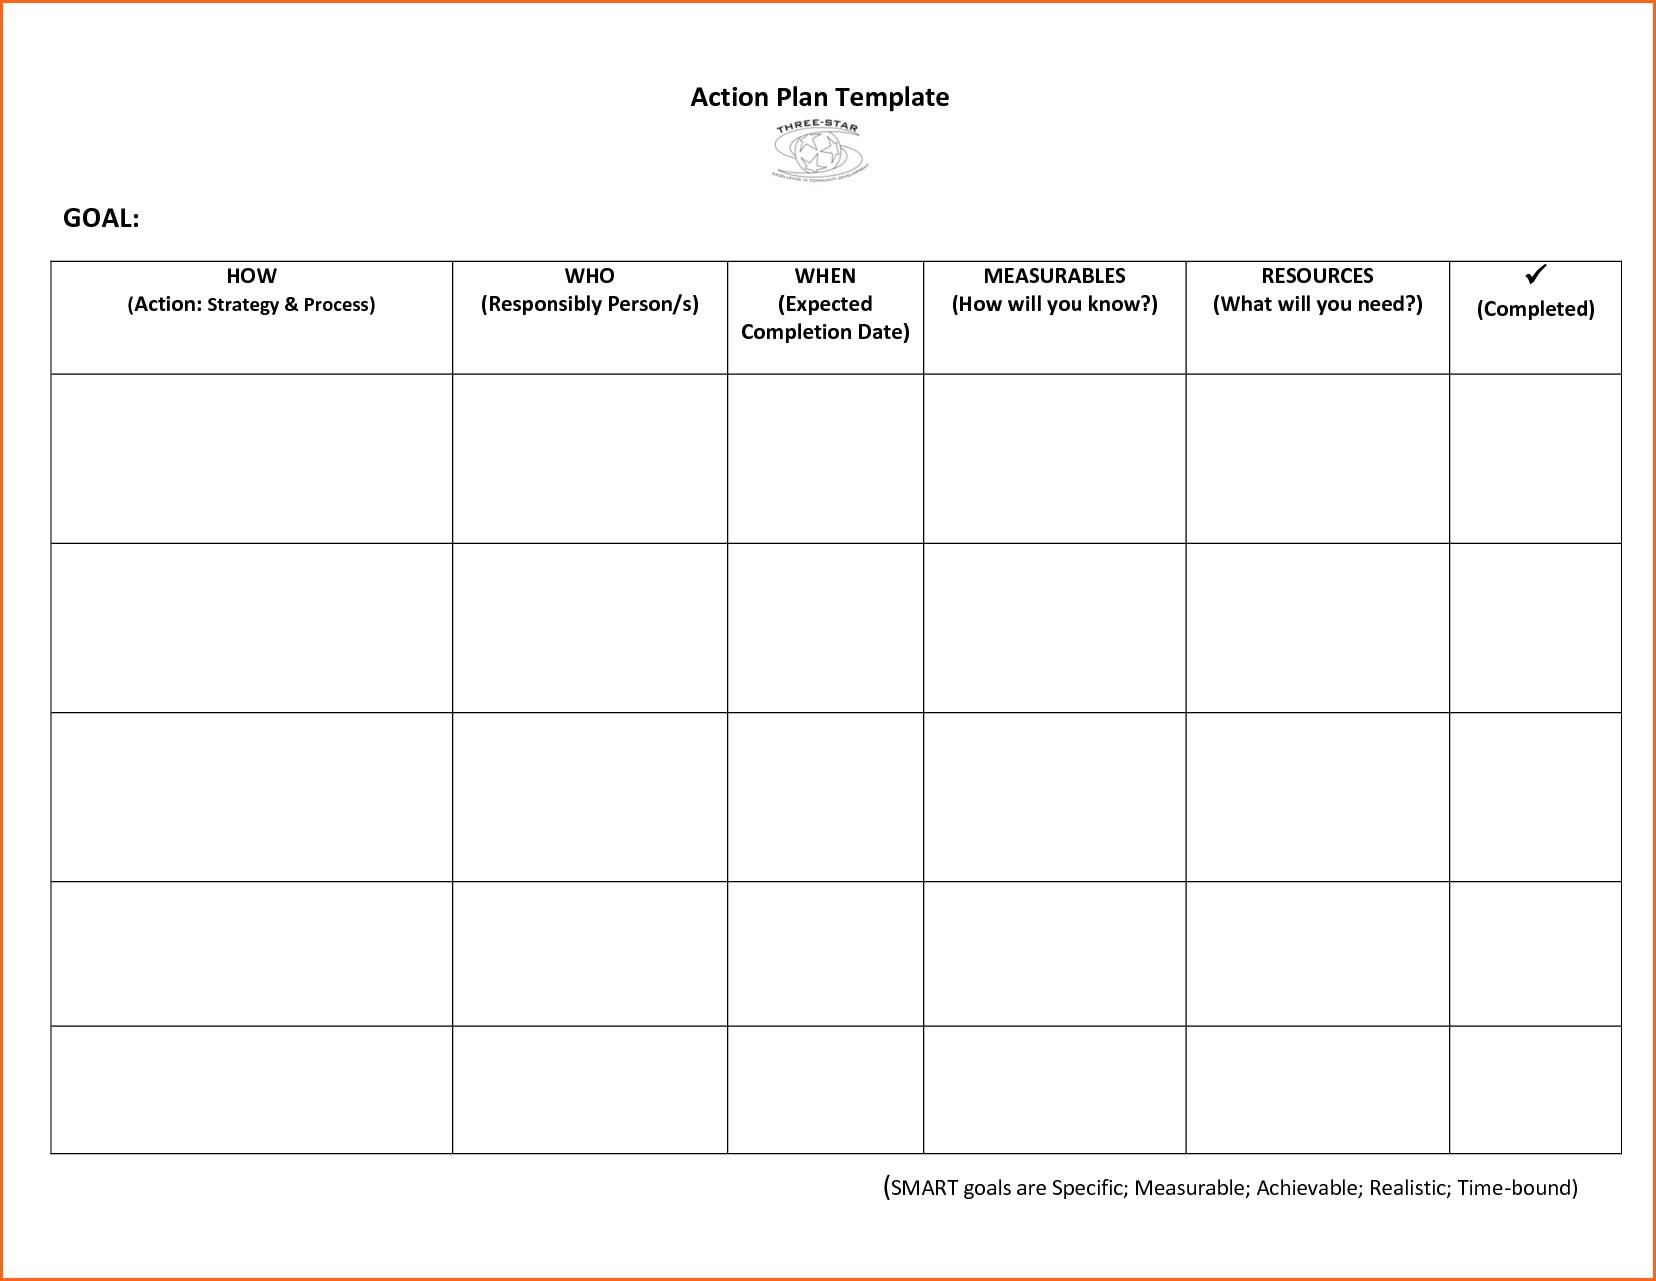 001 Astounding Smart Action Plan Template Image  Nursing Example For Busines FreeFull